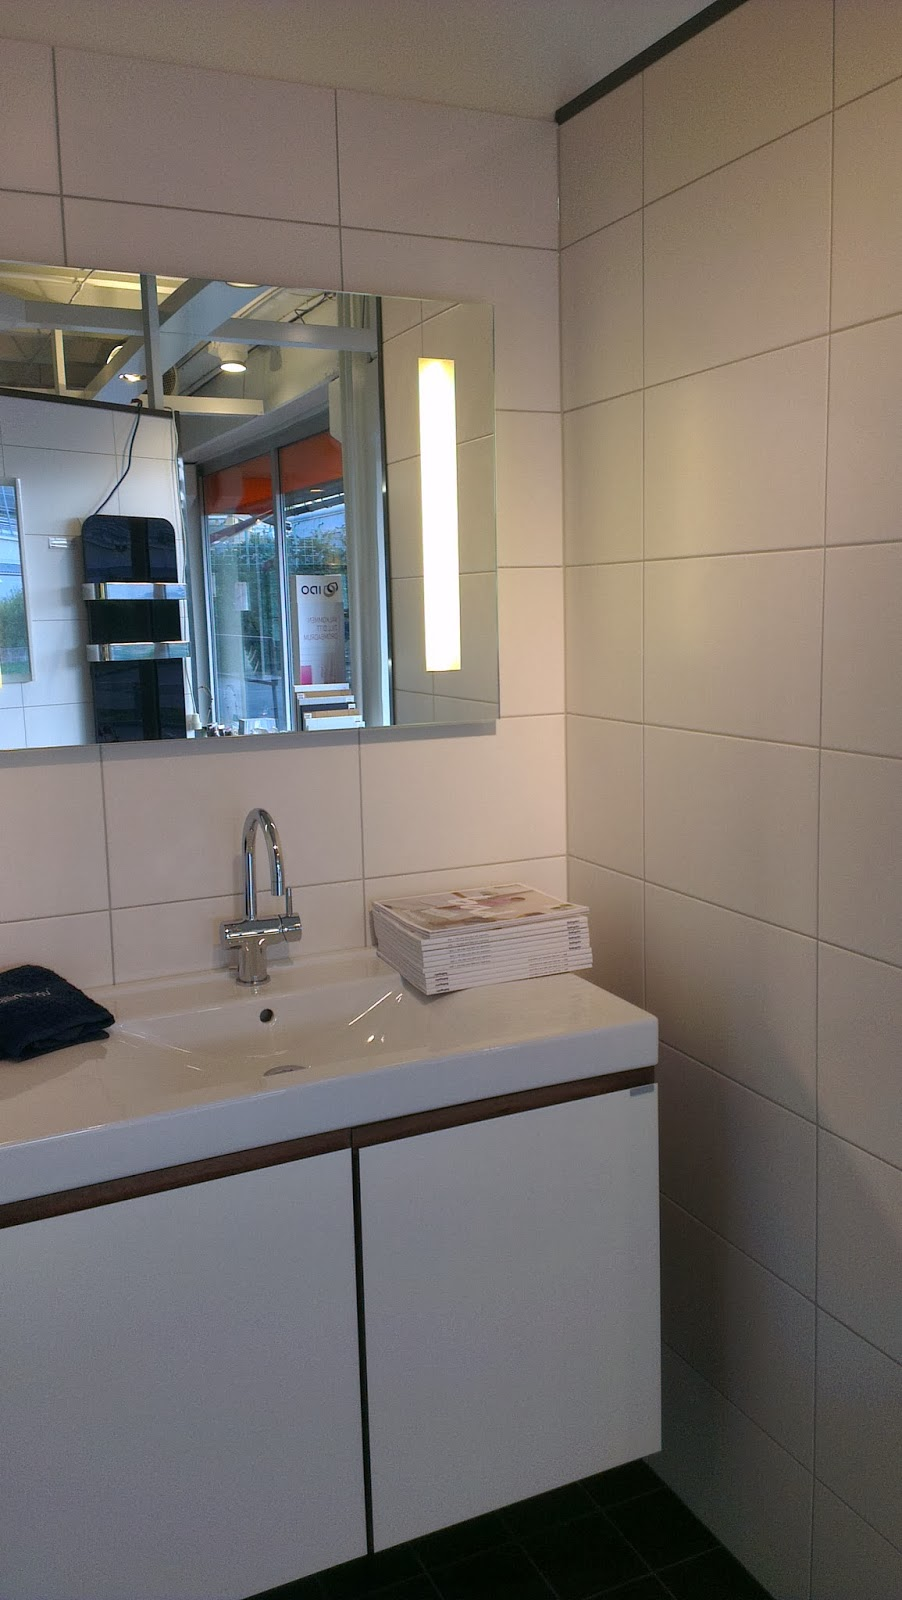 Släng dig i väggen, ernst!: kakelval i badrummet